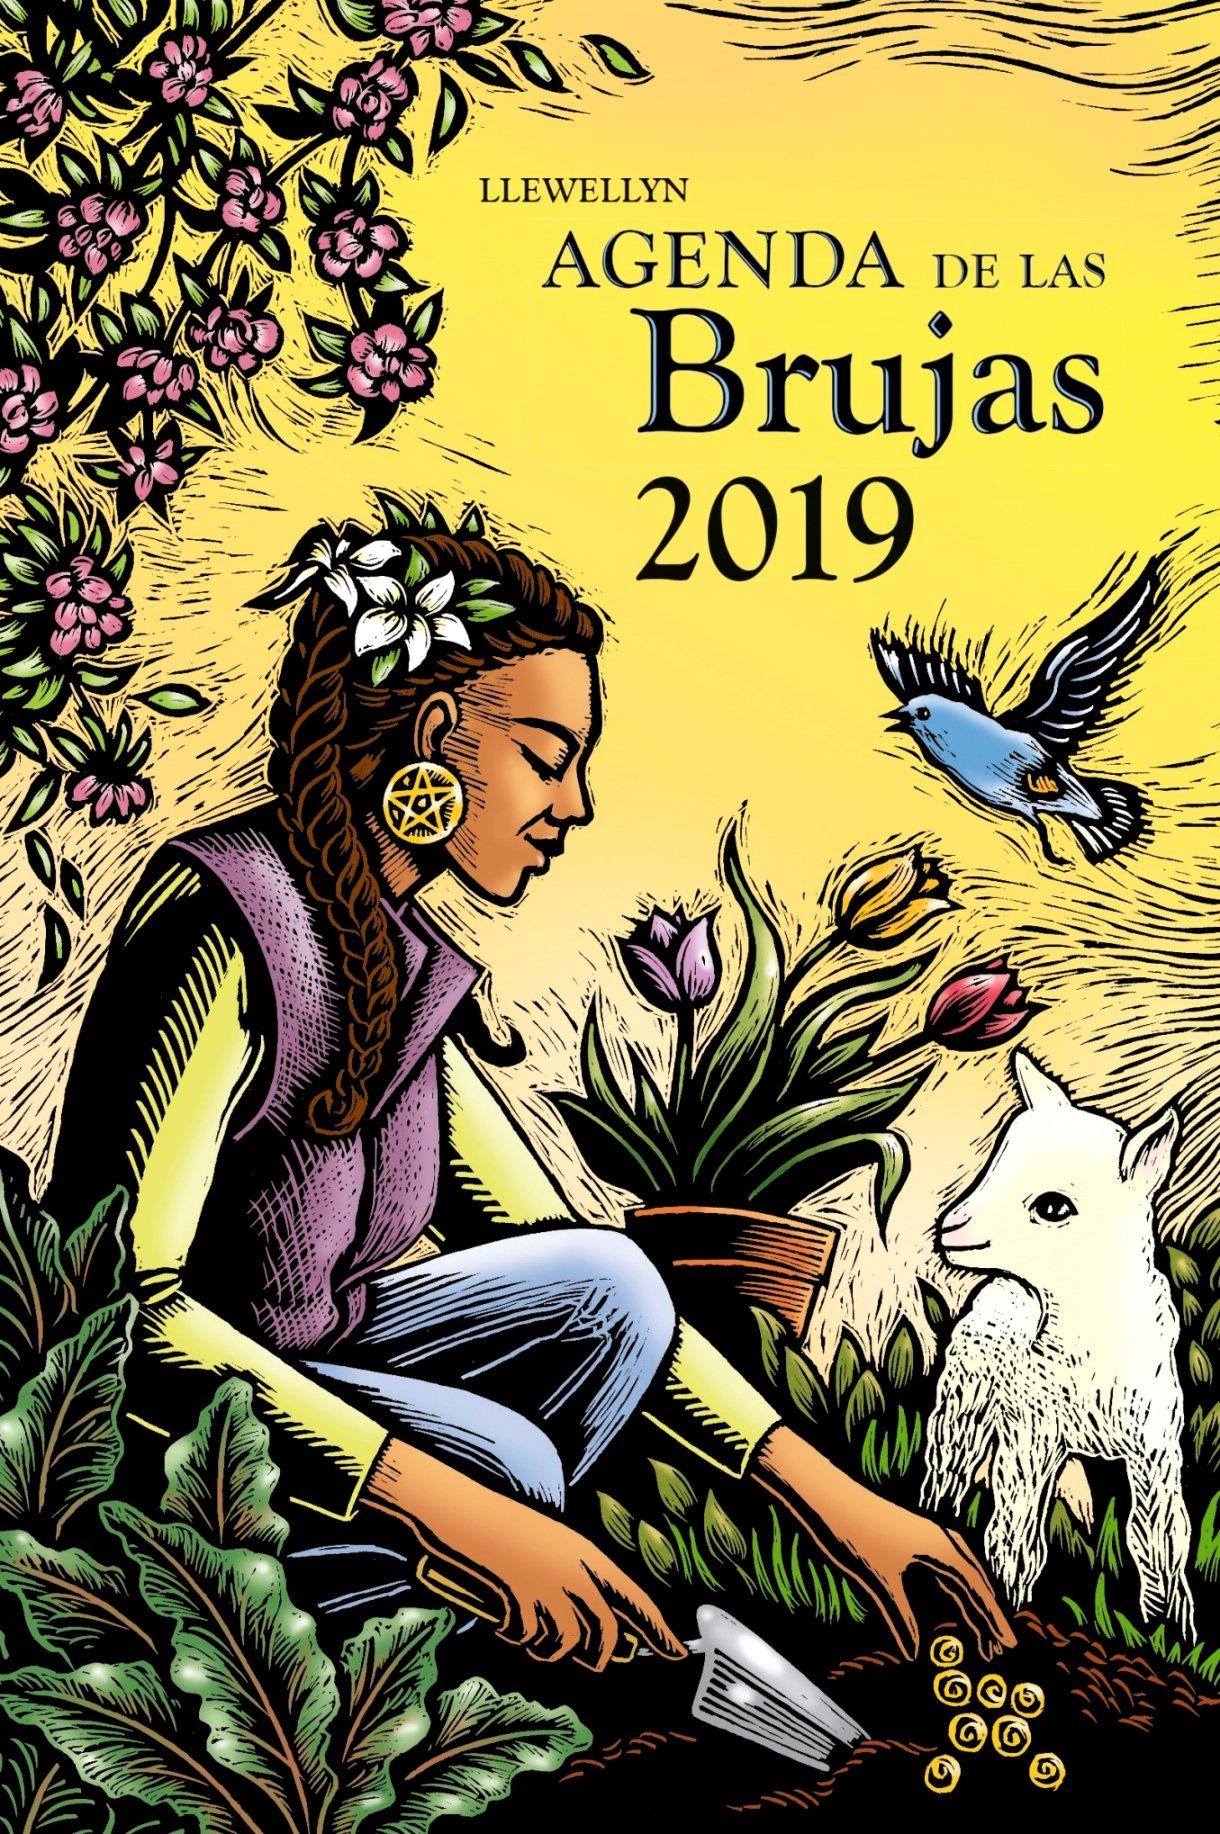 Agenda de Las Brujas 2019 (Spanish Edition): Llewellyn ...